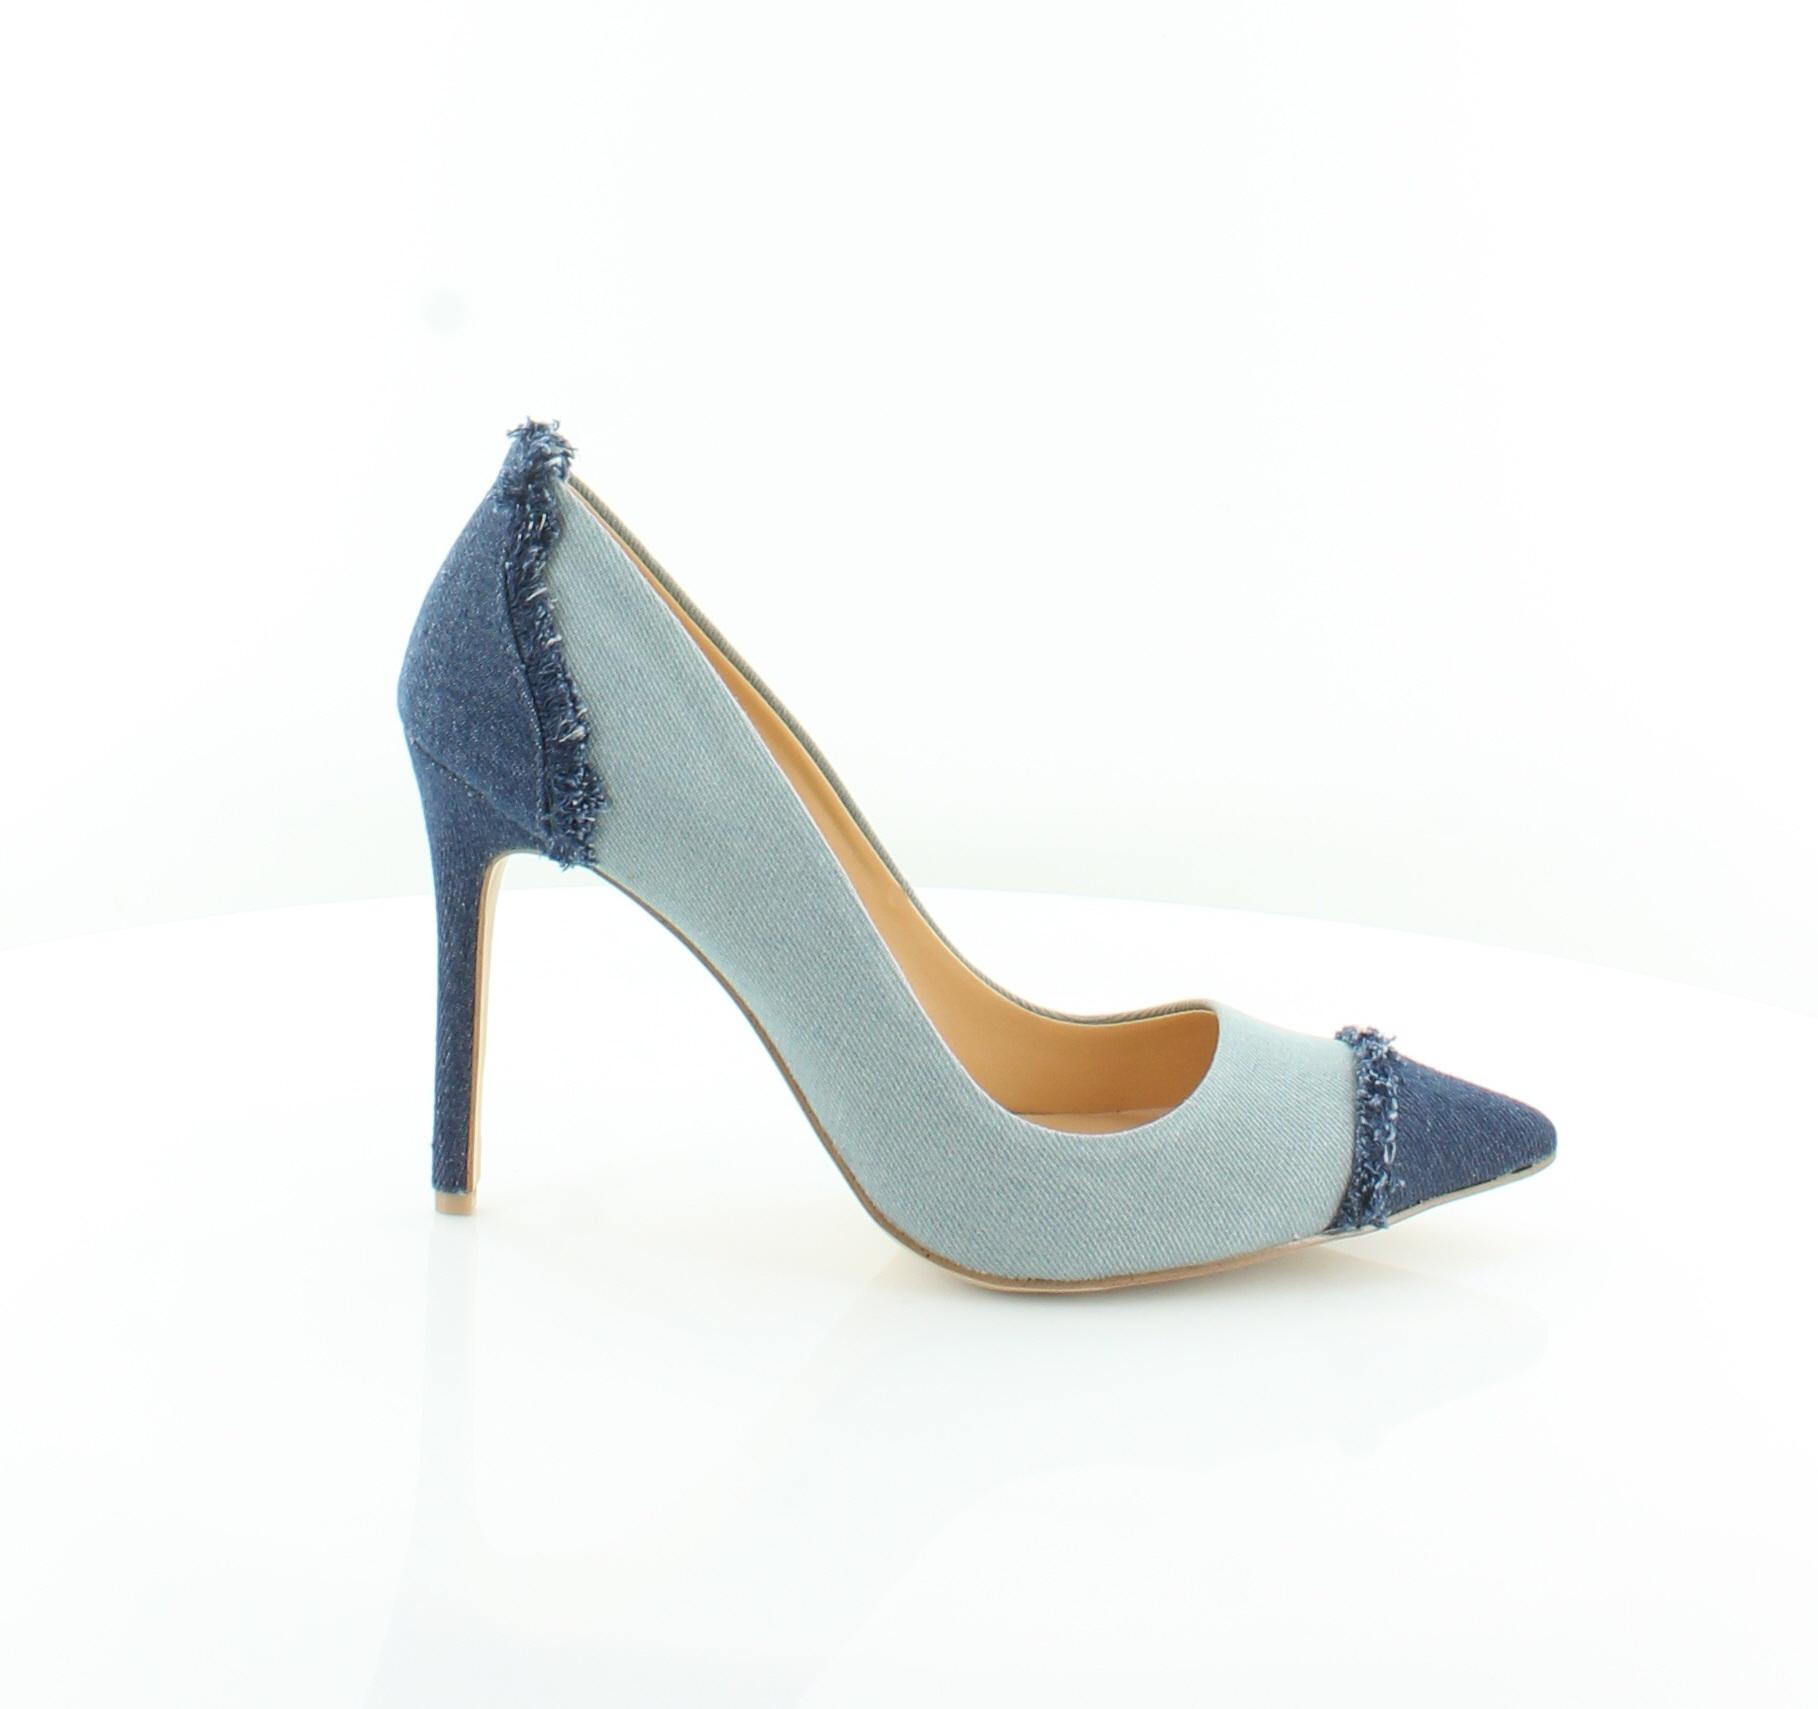 Daya by Zendaya New Shelby blu donna scarpe Dimensione 8.5 M Heels MSRP  89